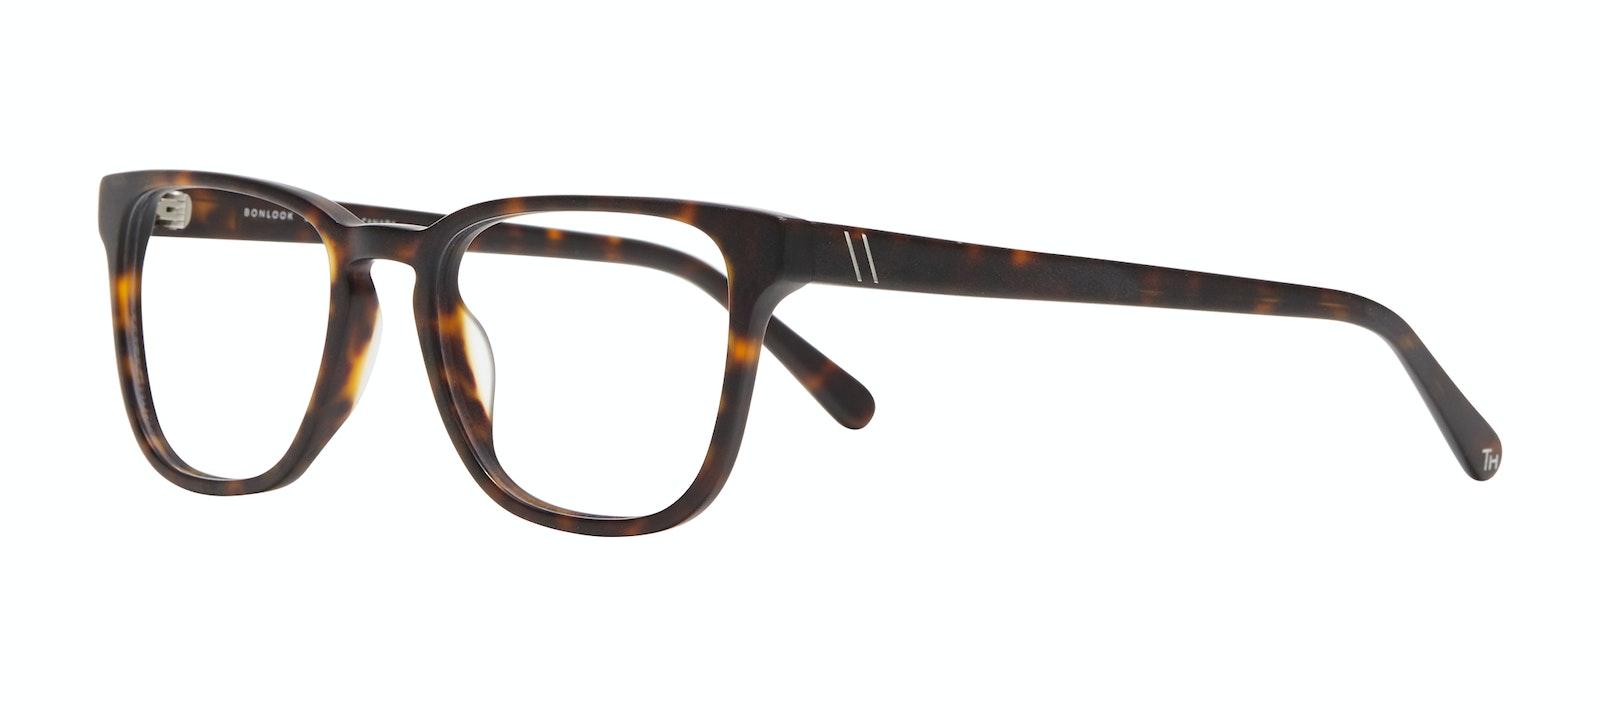 Affordable Fashion Glasses Square Eyeglasses Men Kim XL Matte Tortoise Tilt